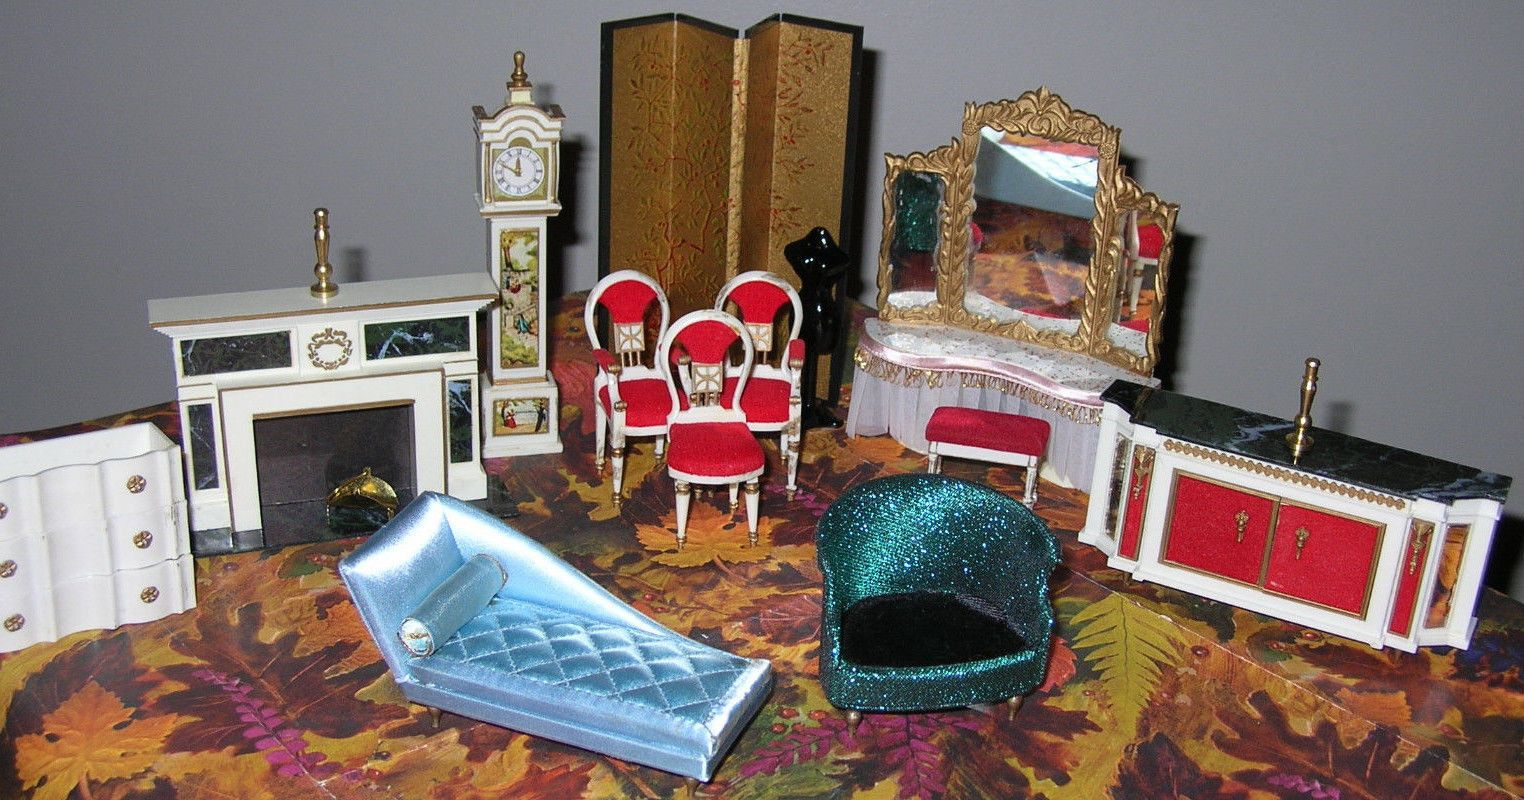 Lot Of Vintage Ideal Petite Princess Doll House Furniture | EBay